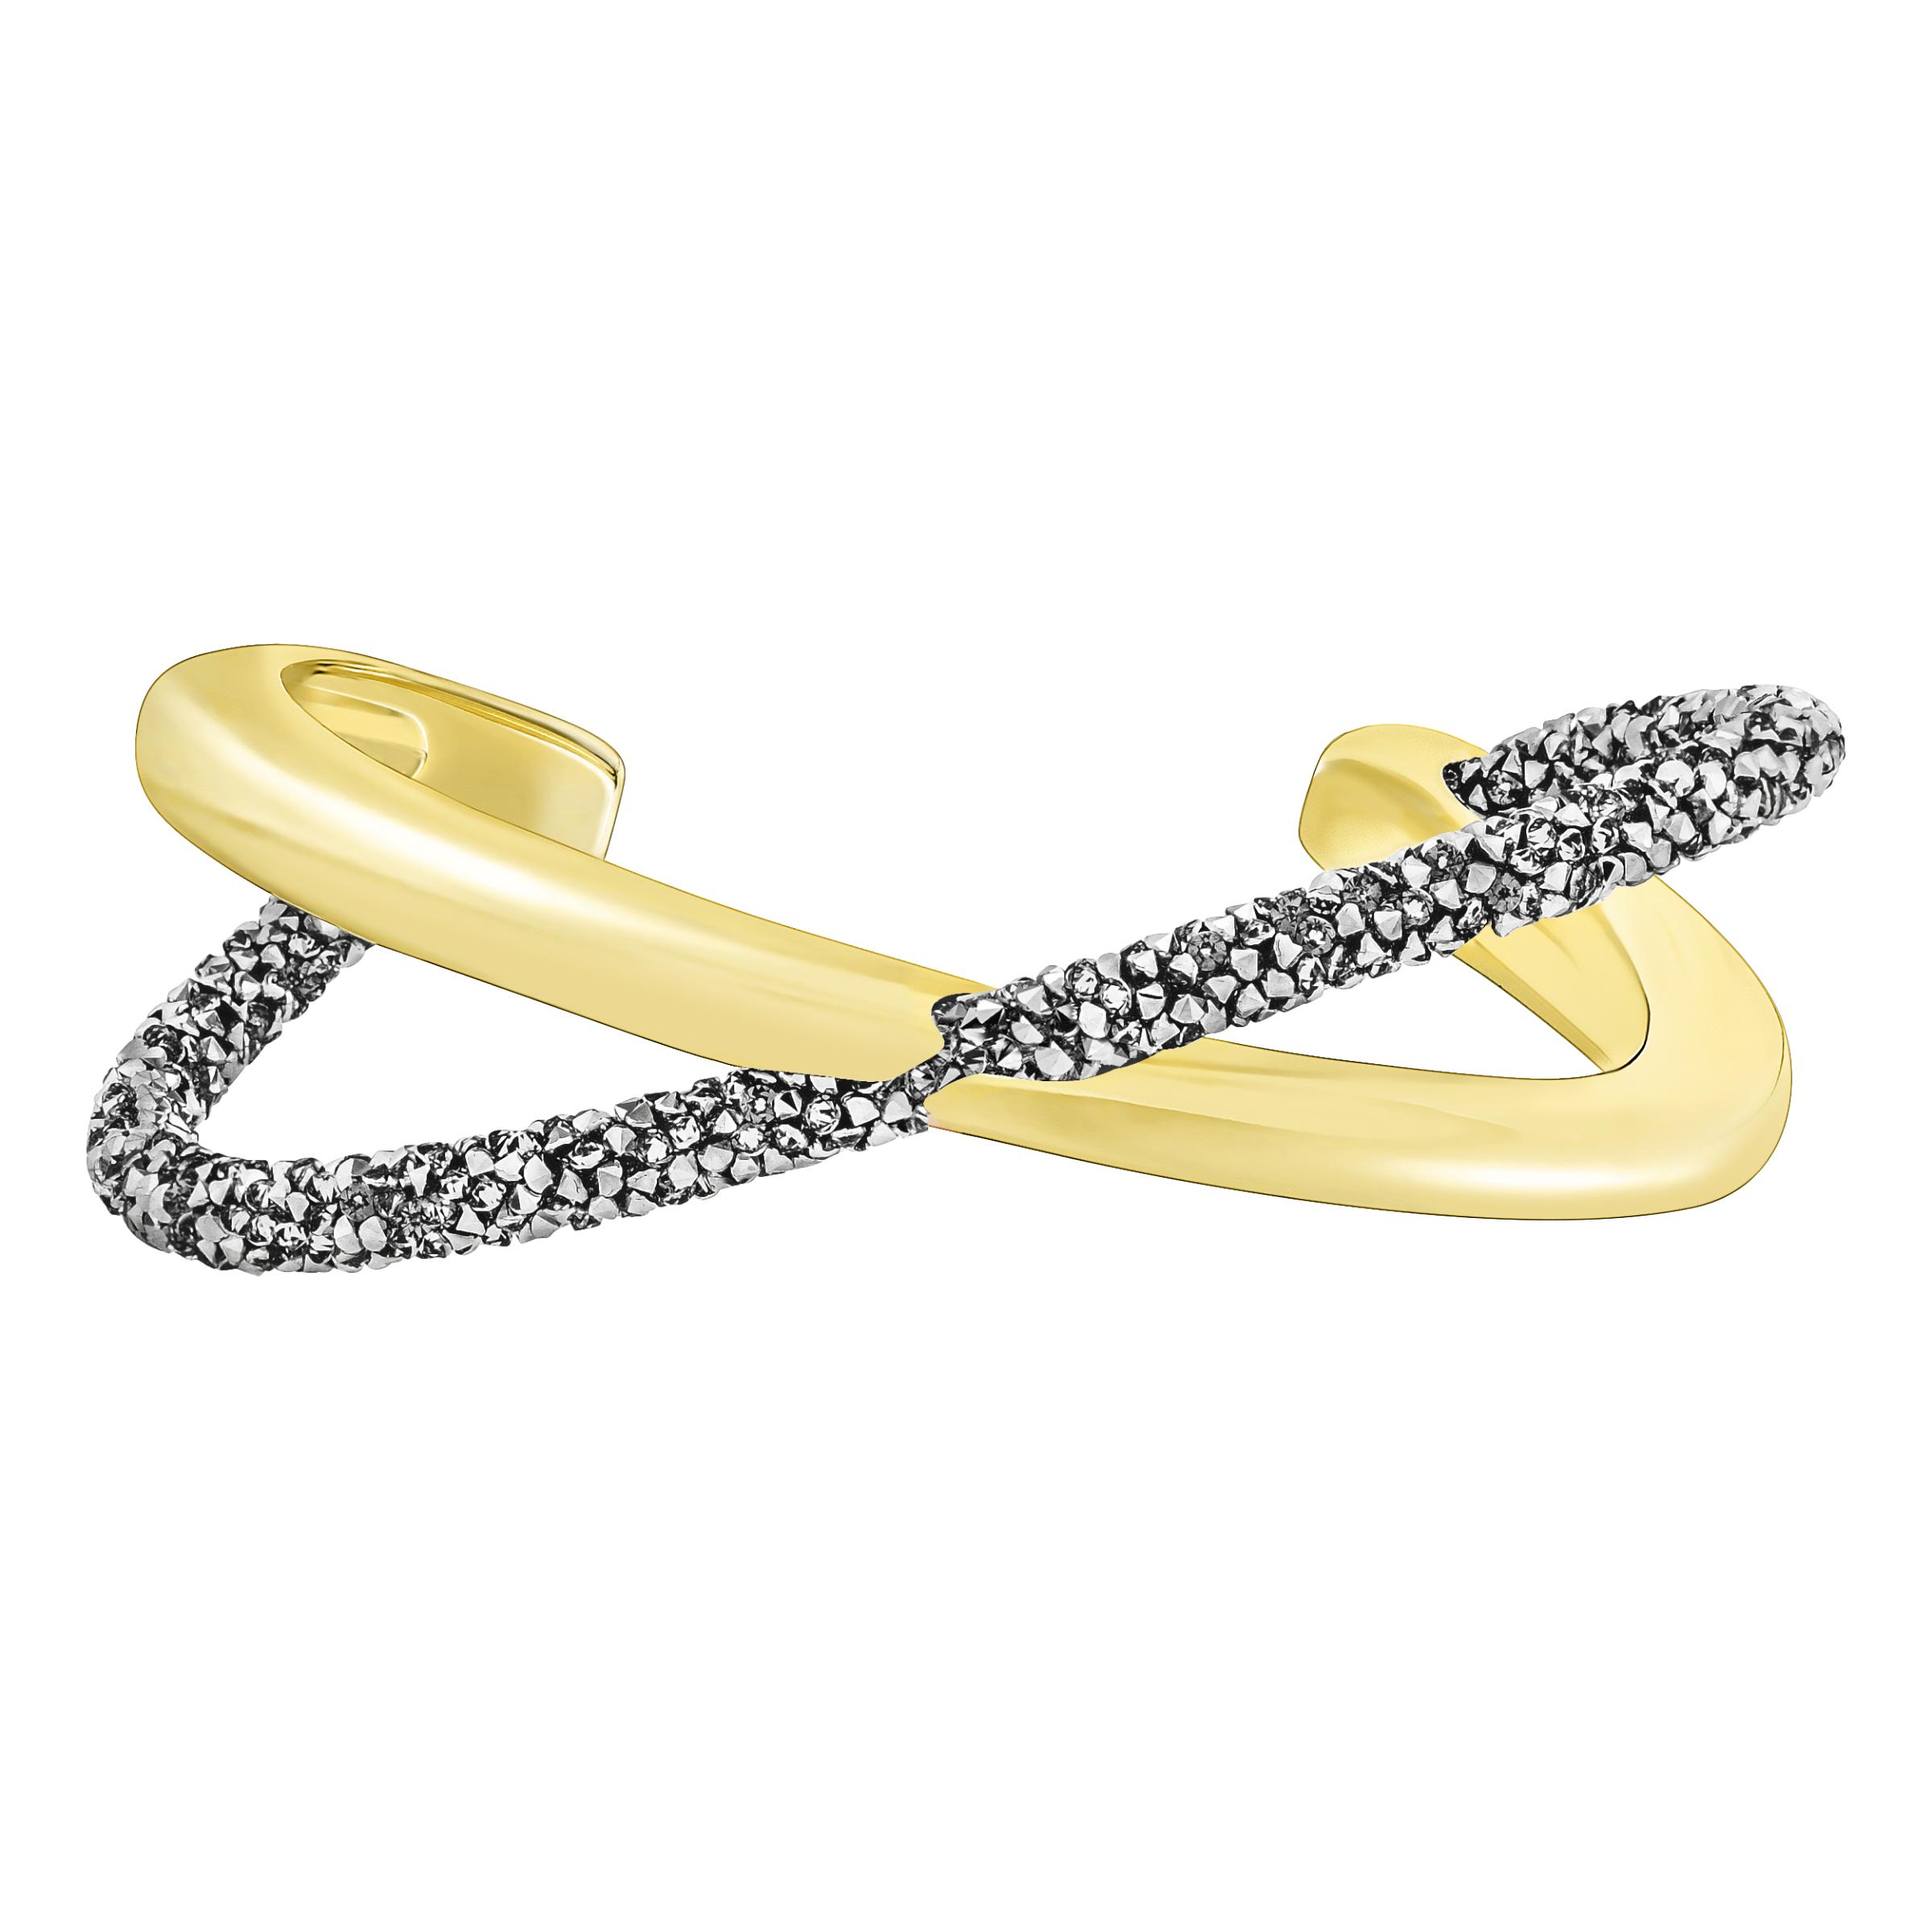 Crystaldust Cross Cuff, Gray, Gold-tone plated